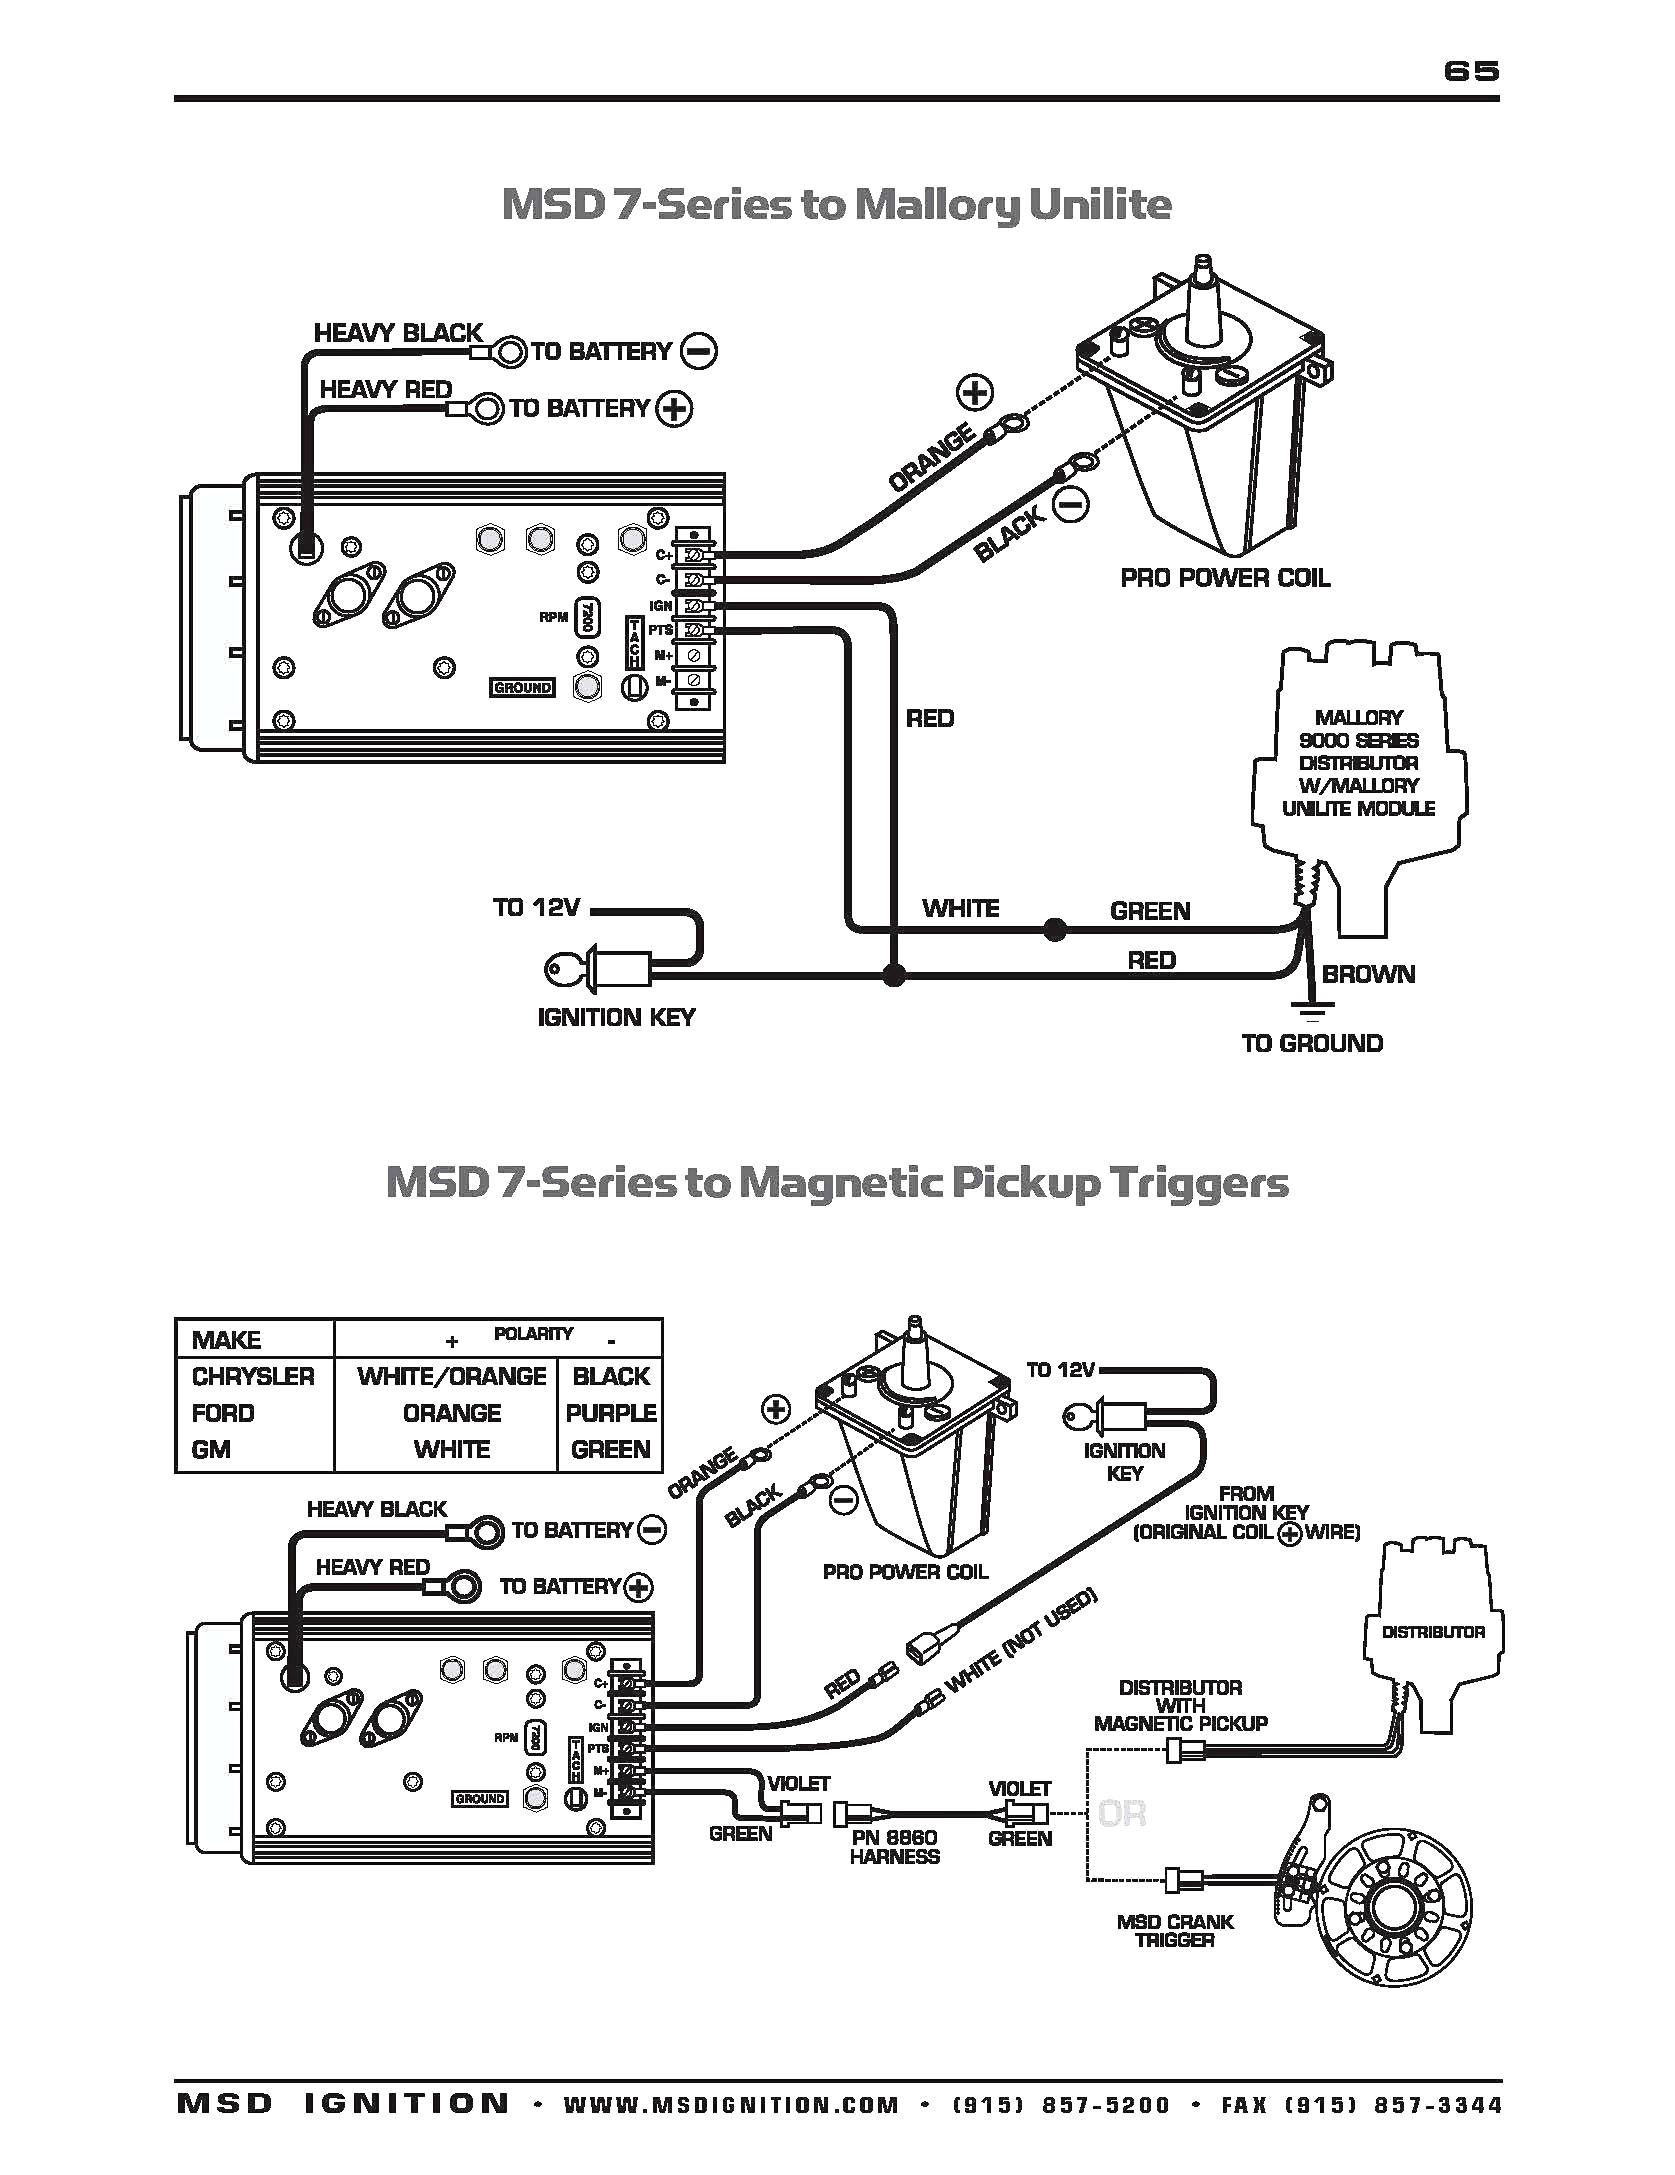 mallory tach wiring diagram wiring diagram datasource mallory ignition tach wiring diagram wiring diagram expert mallory